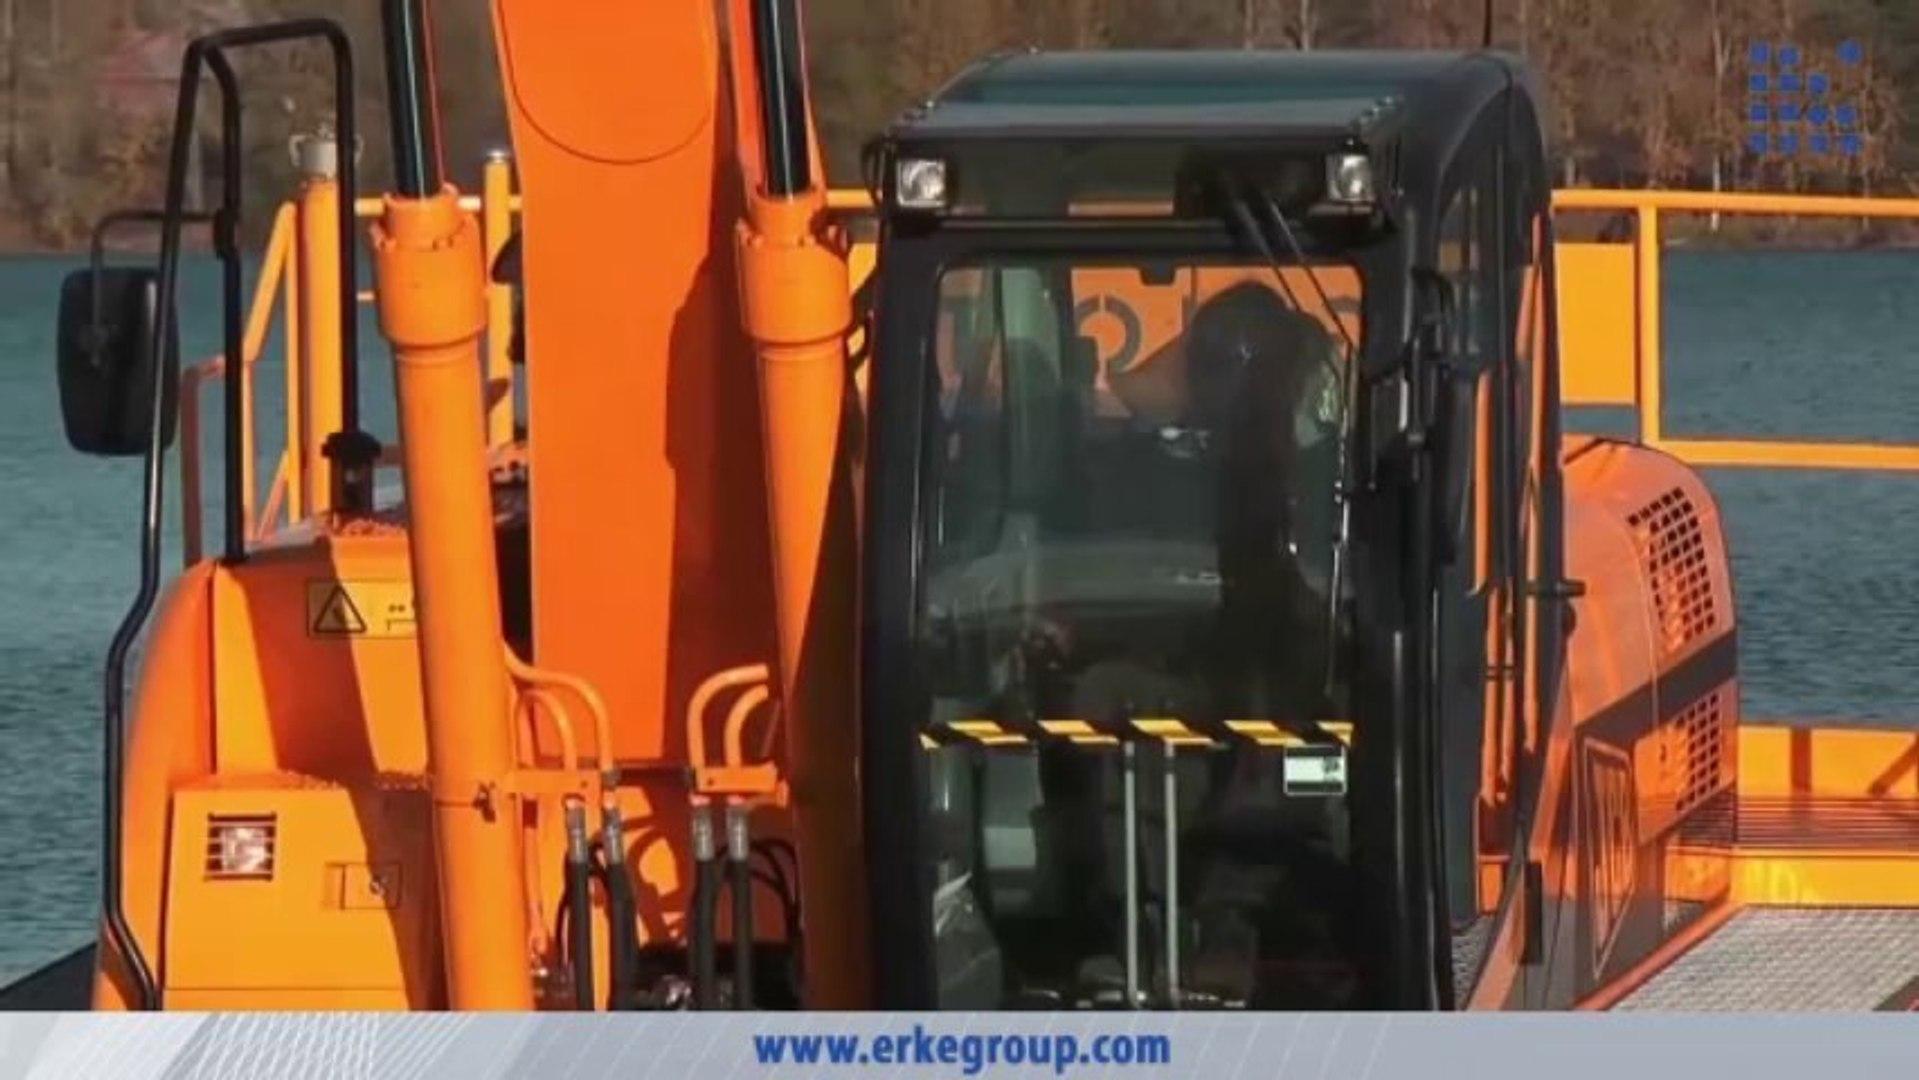 ERKE Dış Ticaret ltd., Big Float 12.24 Amphibious Excavator - River Cleaning - www.erkegroup.com